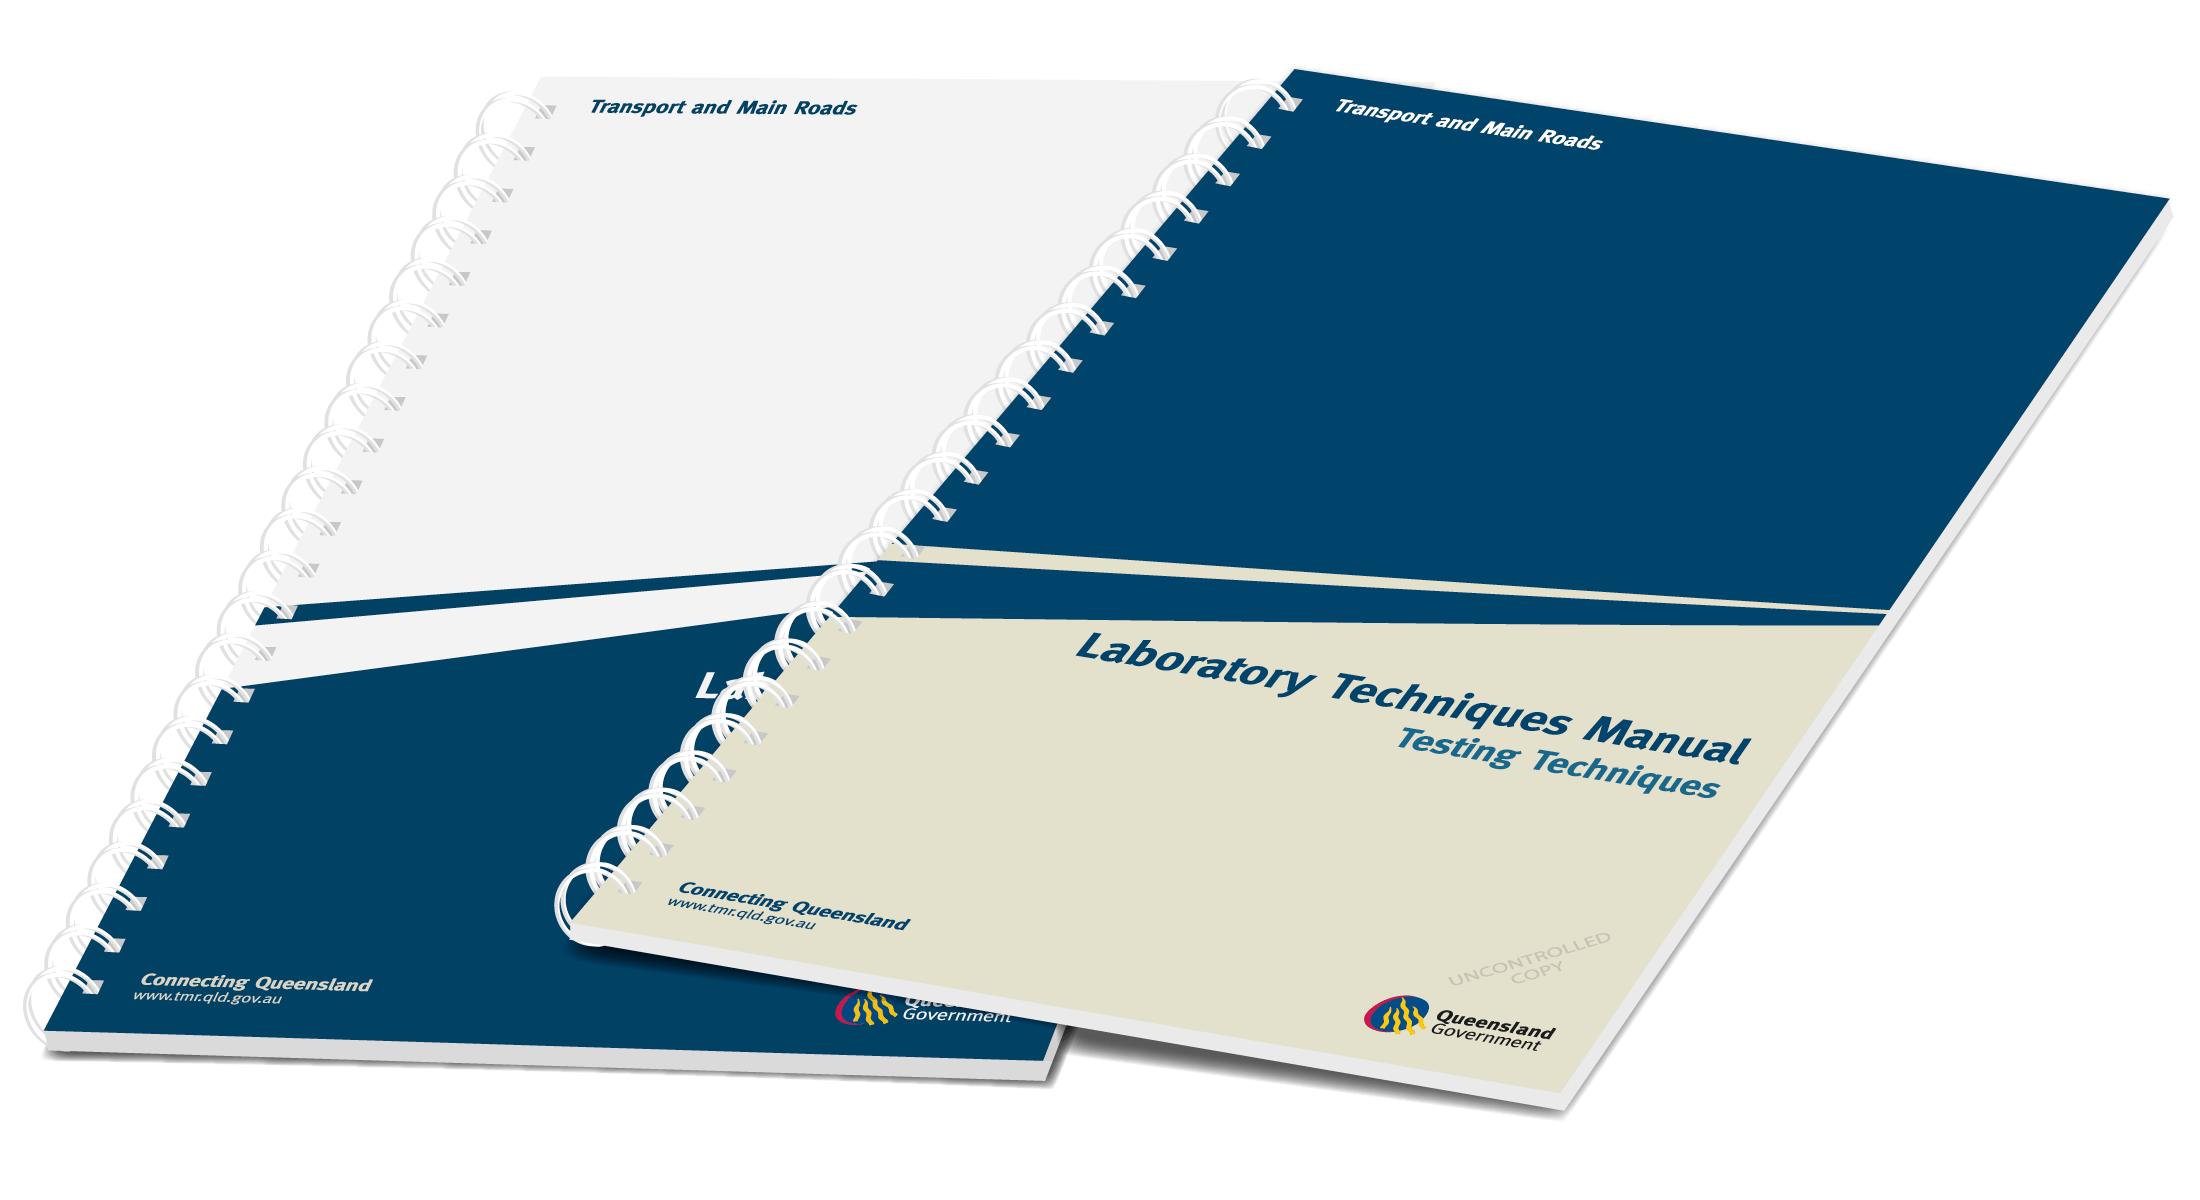 Laboratory Techniques Manuals